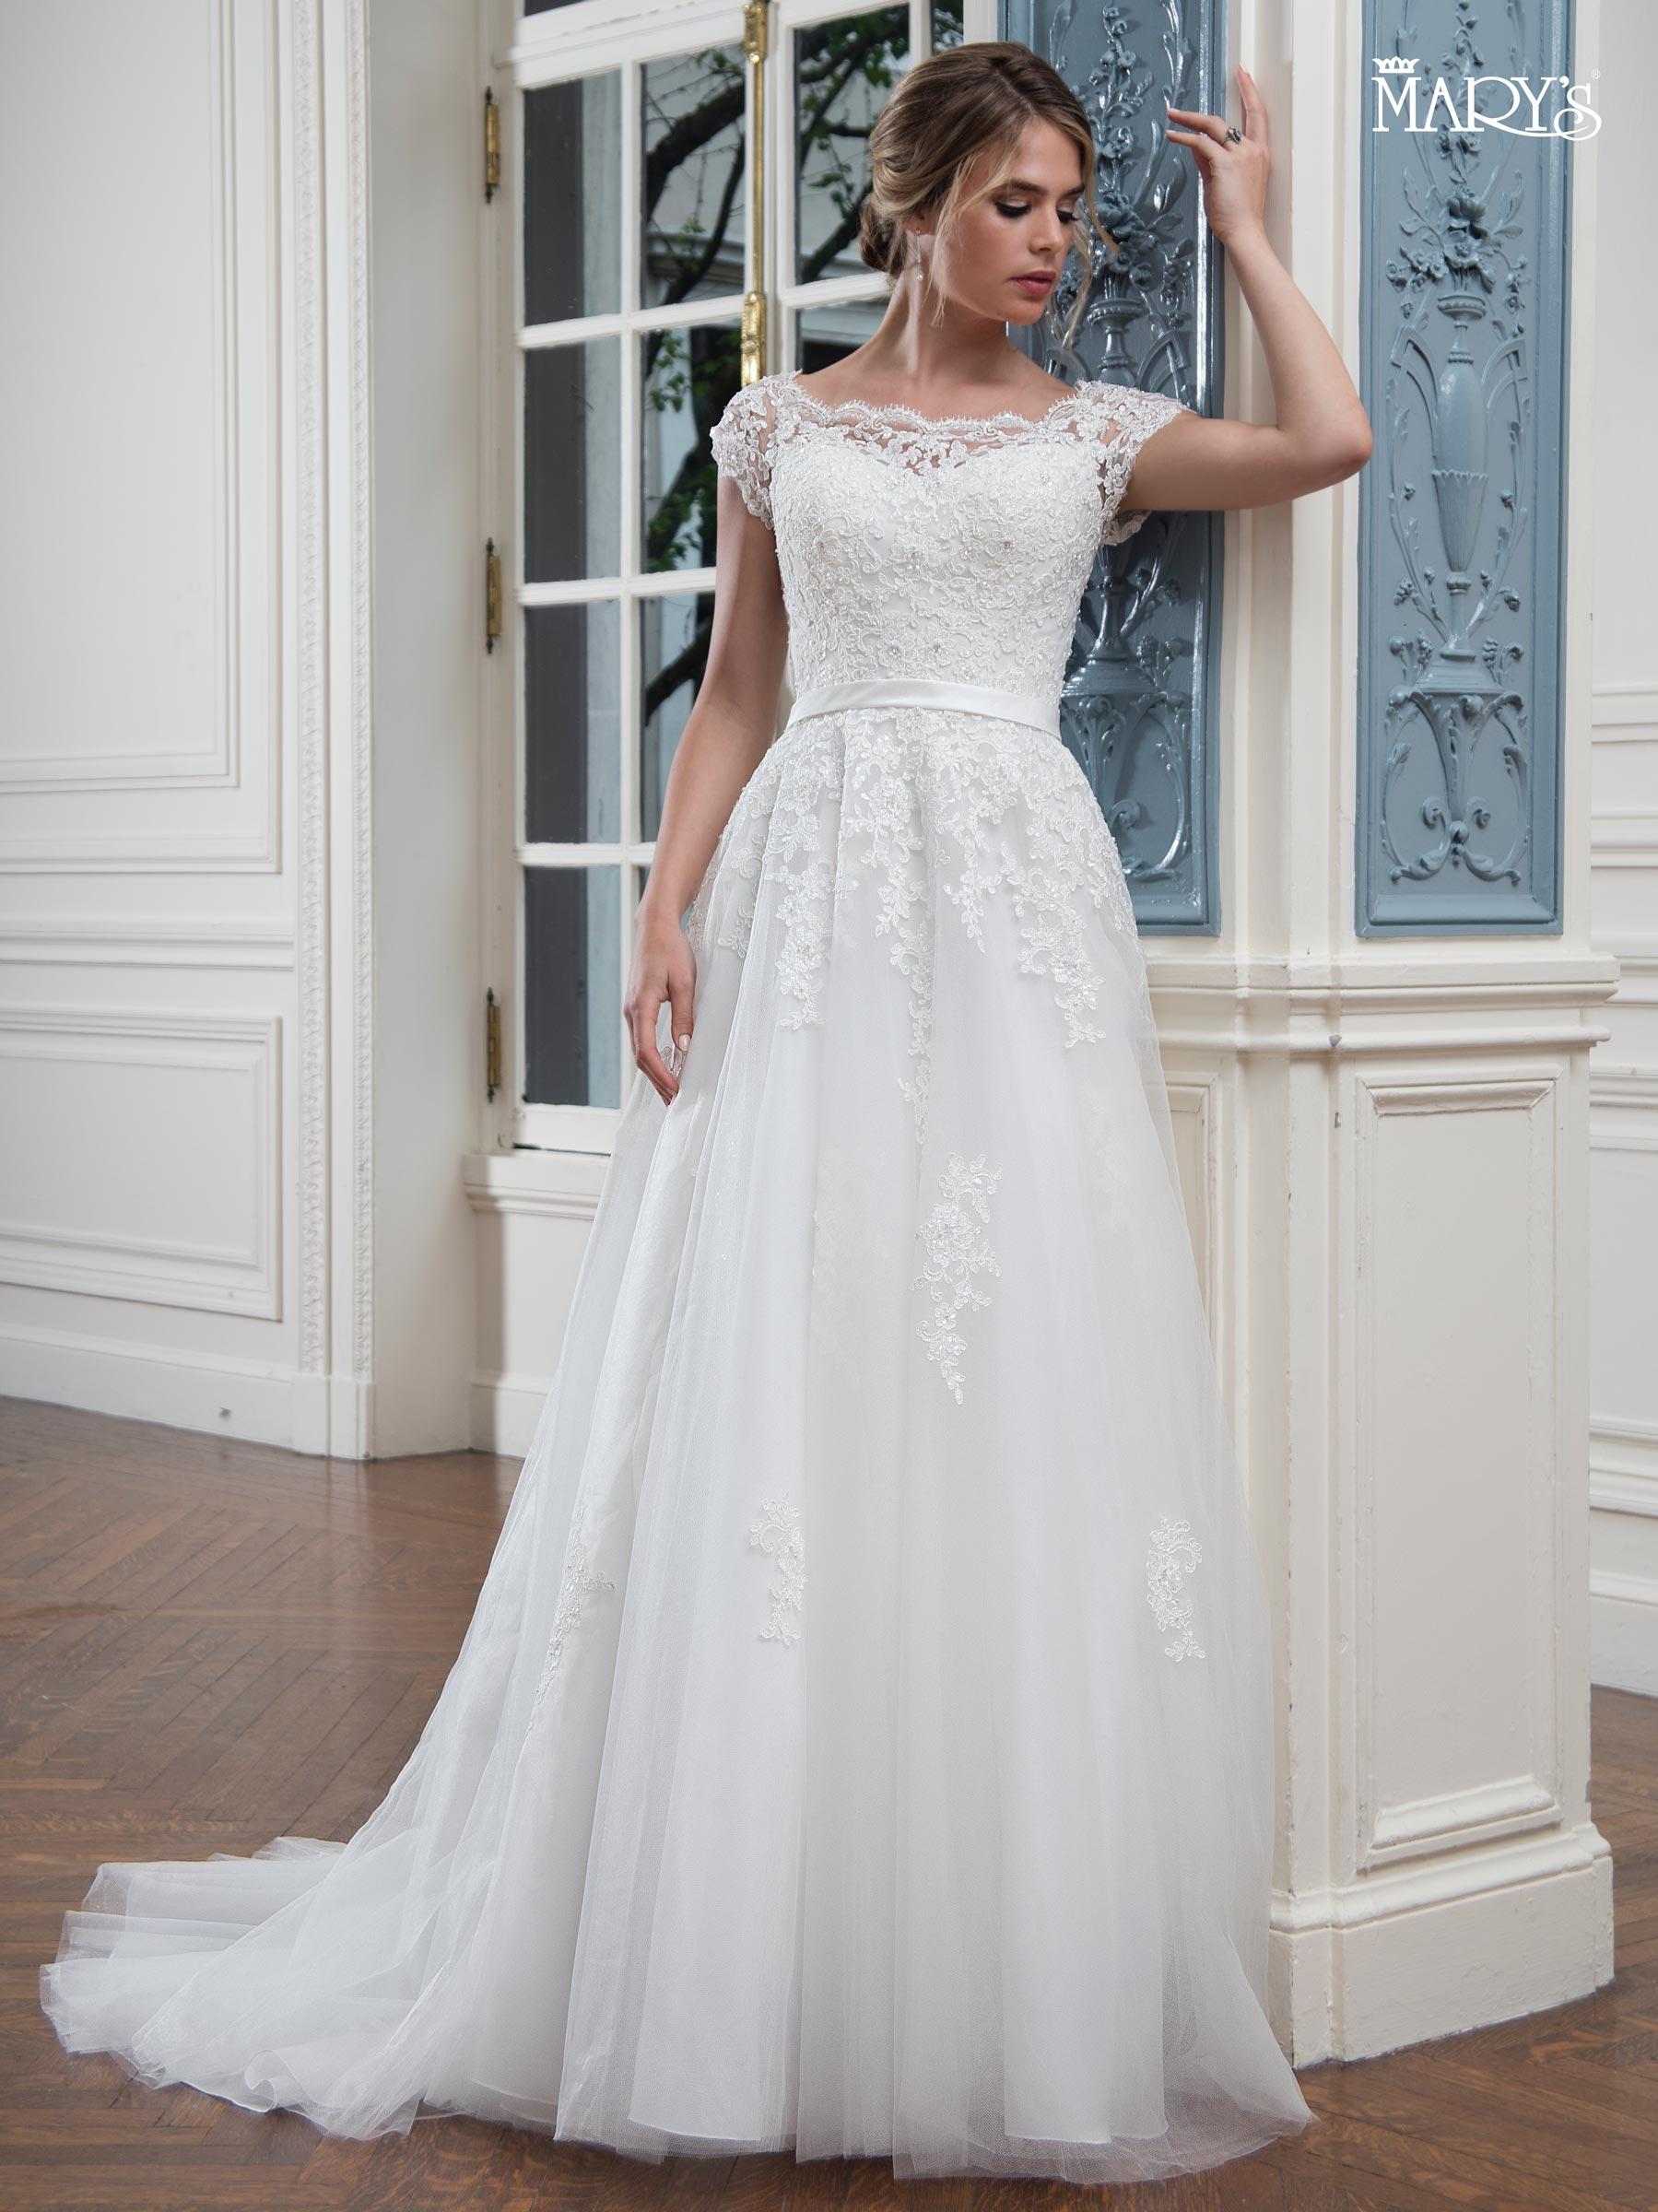 Bridal Wedding Dresses | Mary's | Style - MB3016